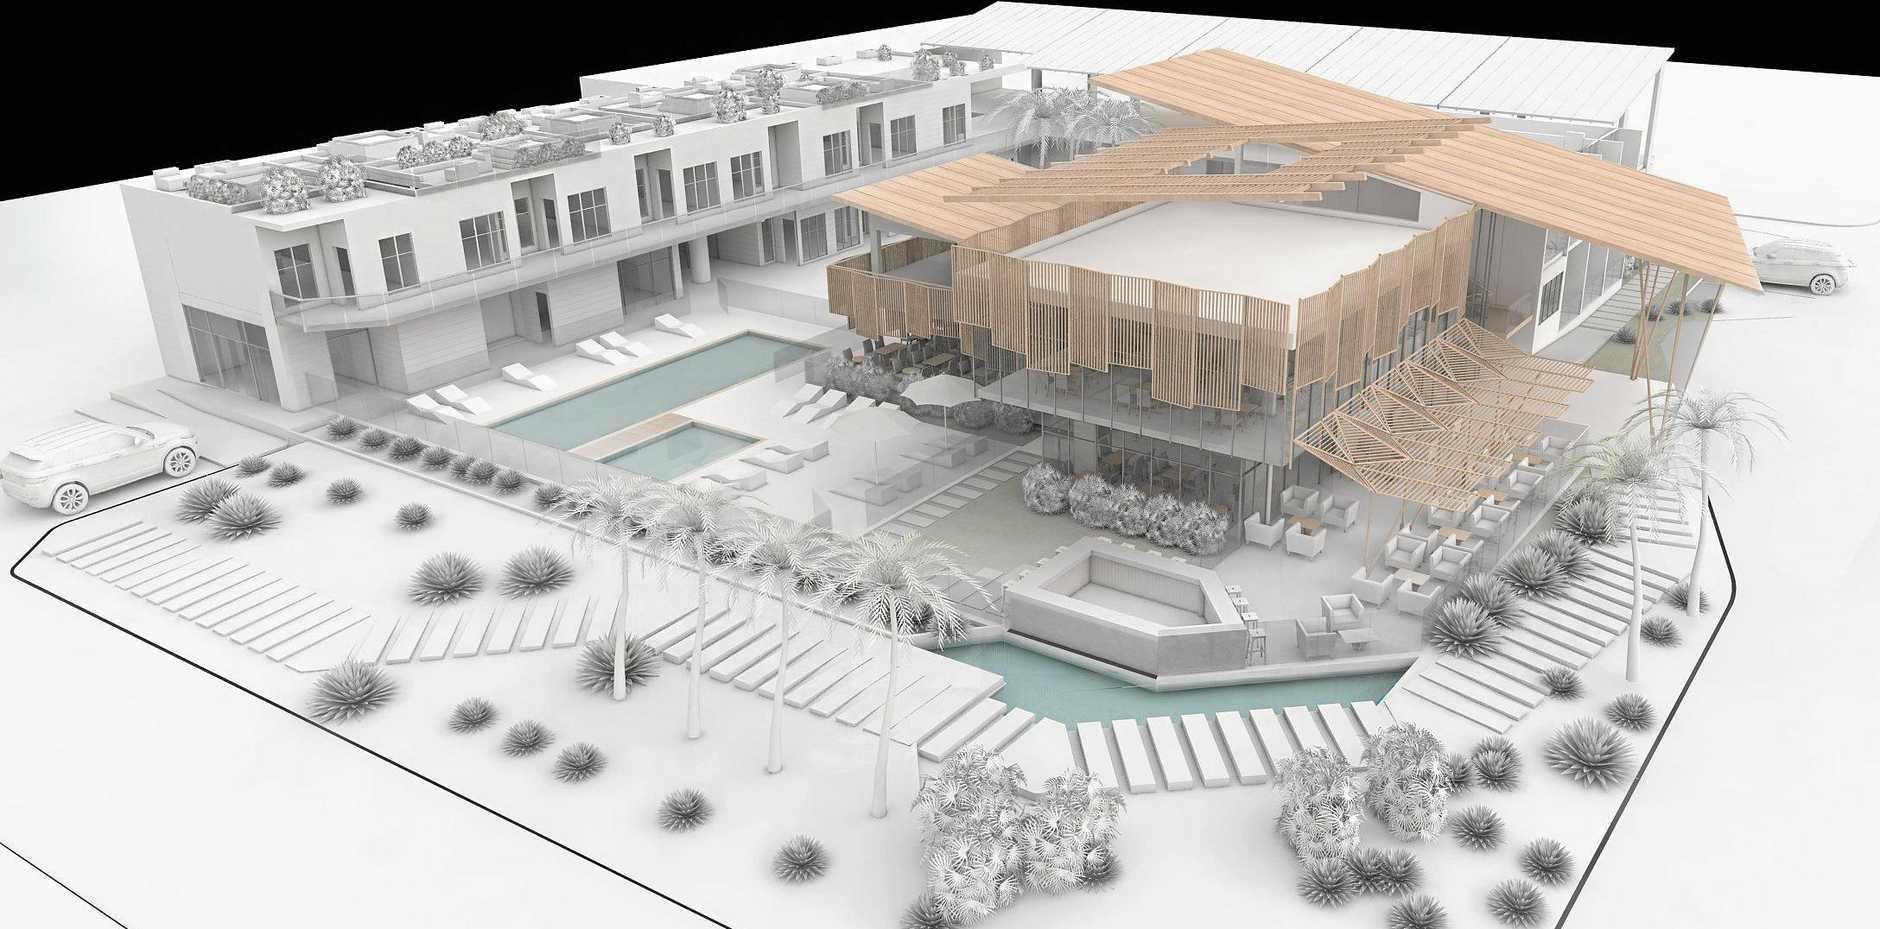 Concept design of the Surf En Yoga Resort planned for development in Iluka.